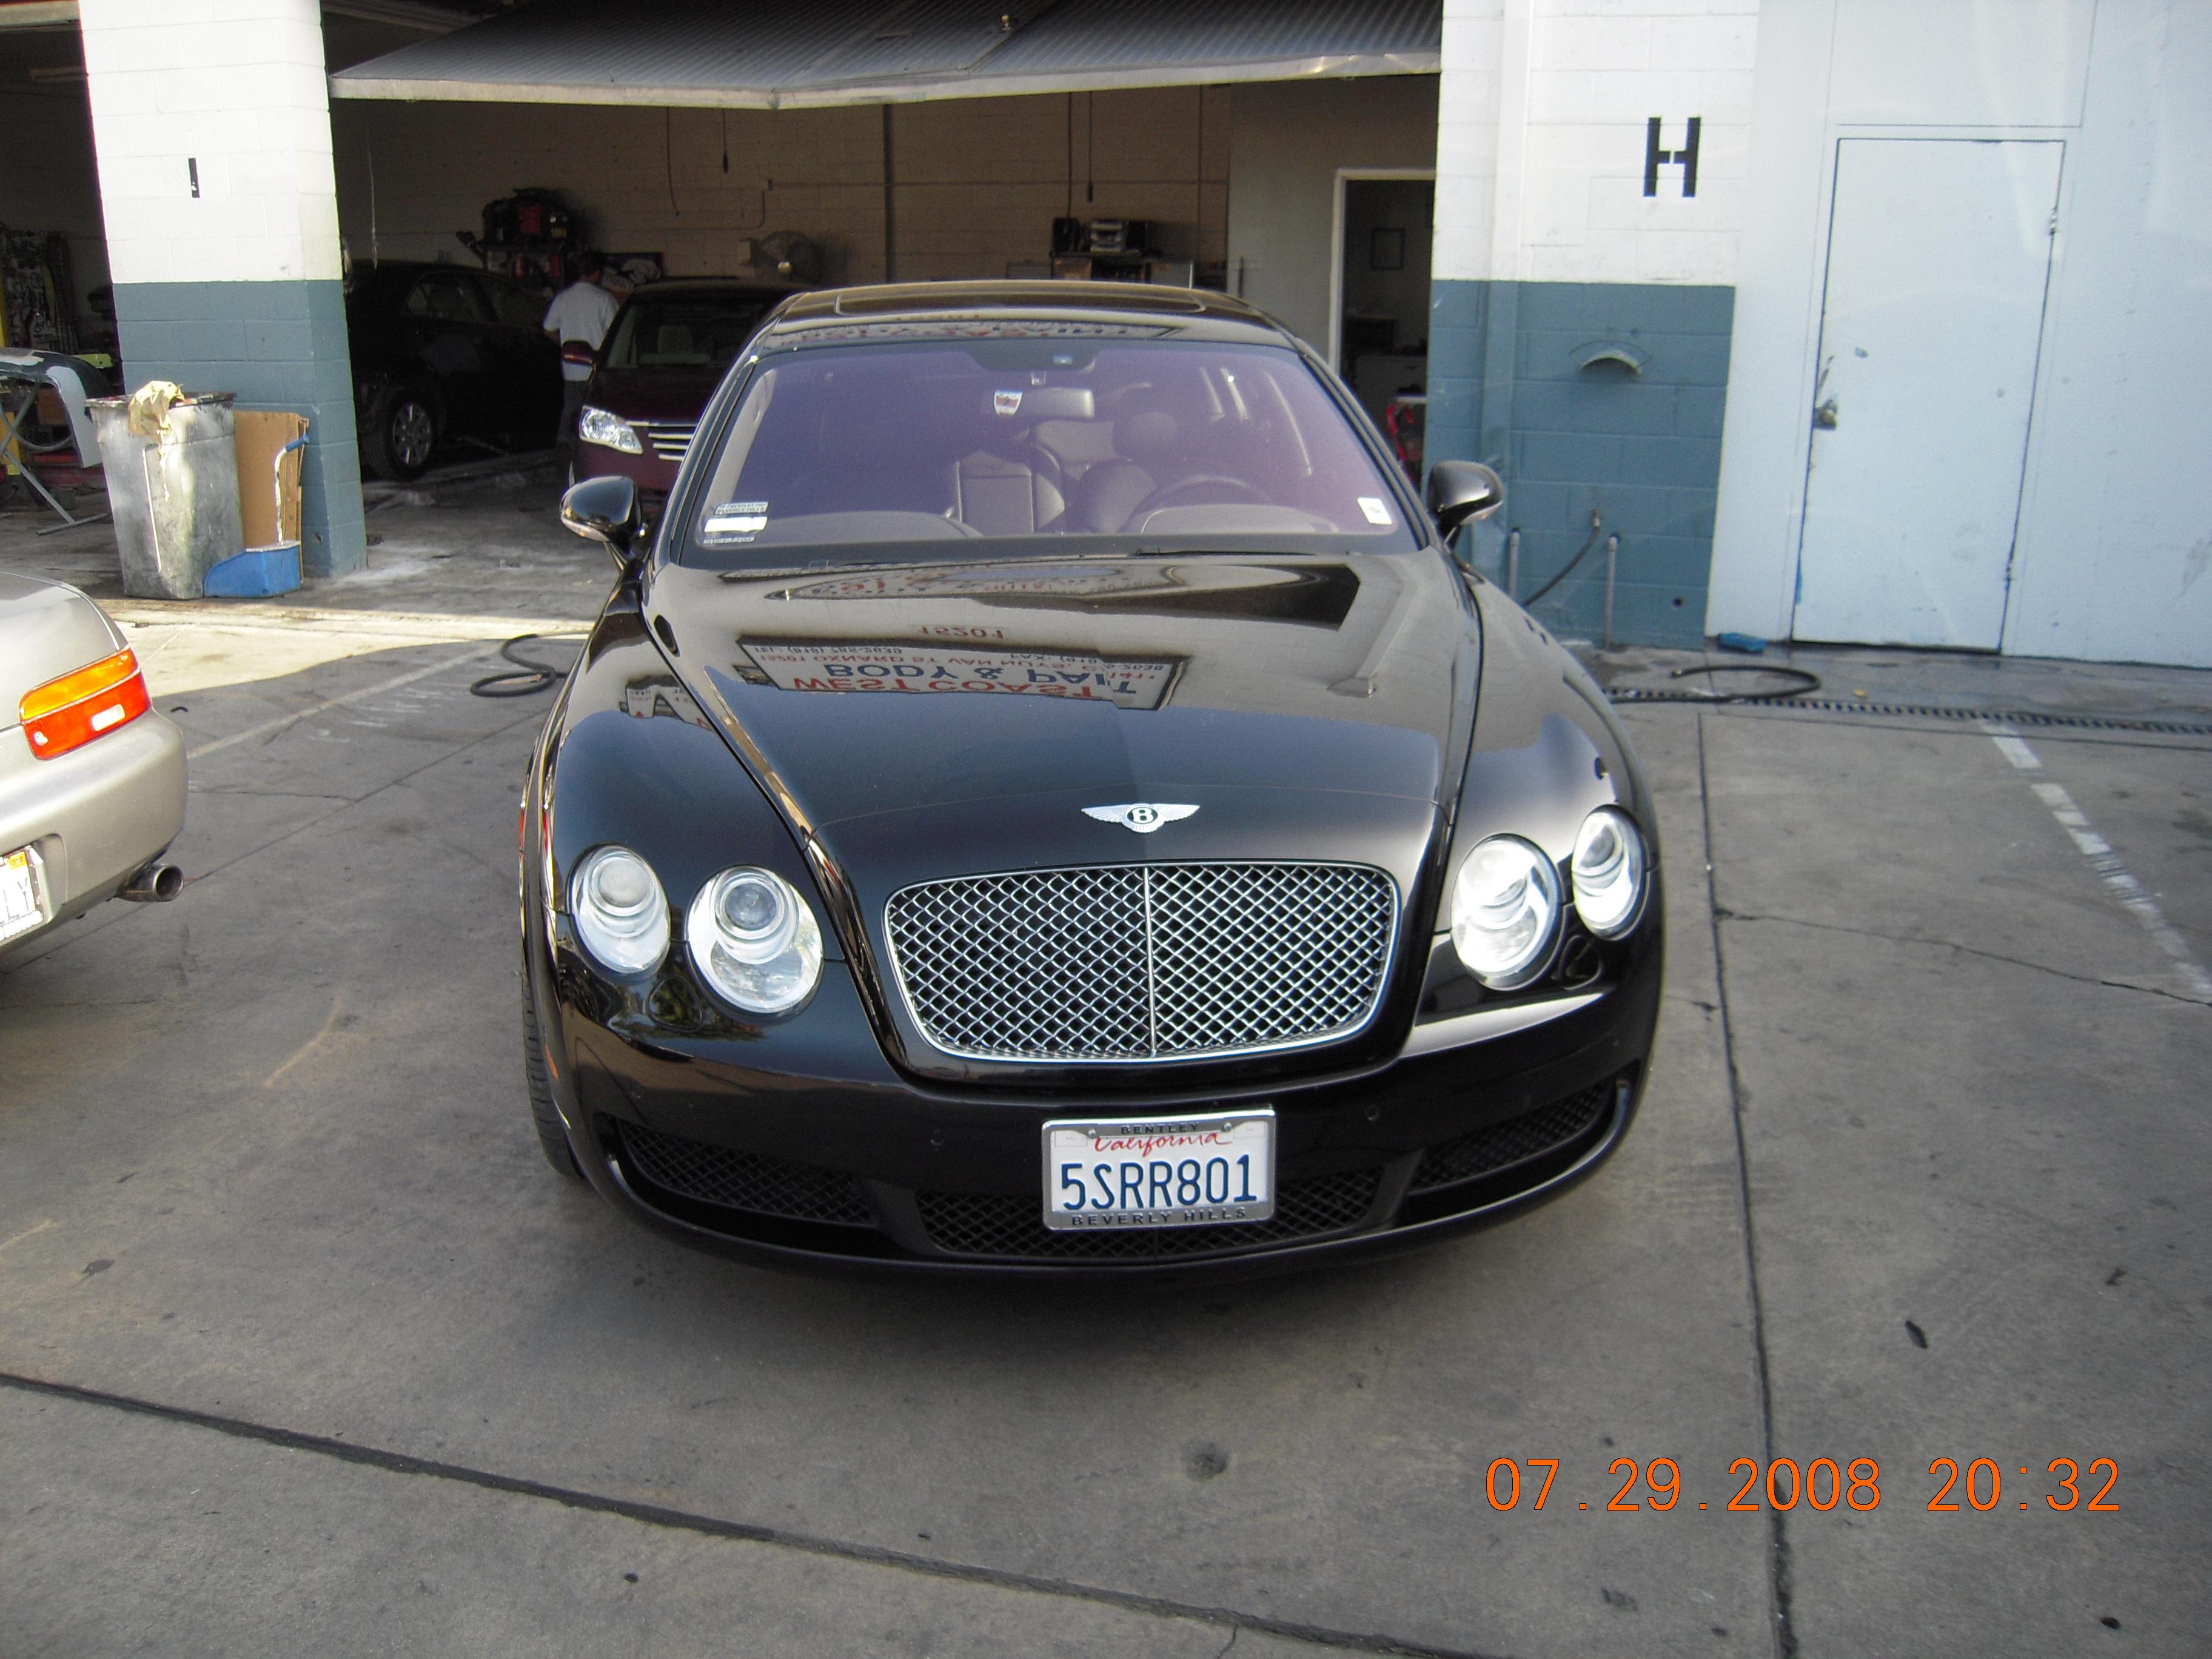 West-Coast-Body-And-Paint-Black-Bentley (5)